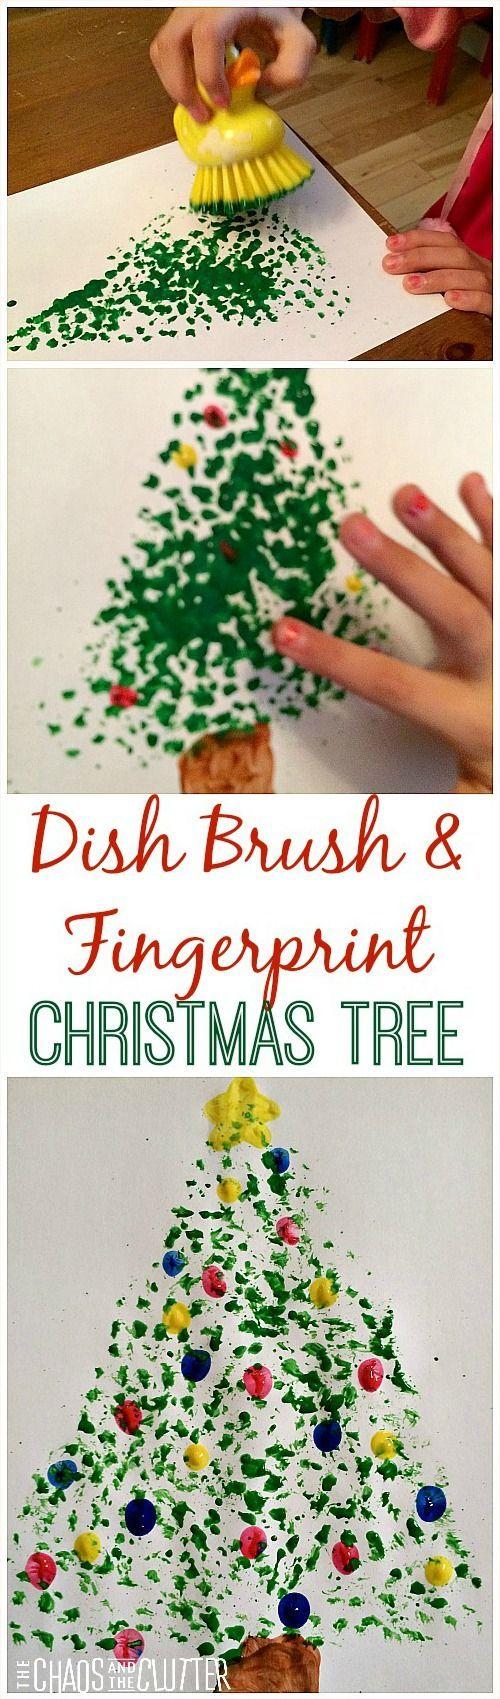 Dish Brush and Fingerprint Painted Christmas Tree - so cute!                                                                                                                                                                                 Mais